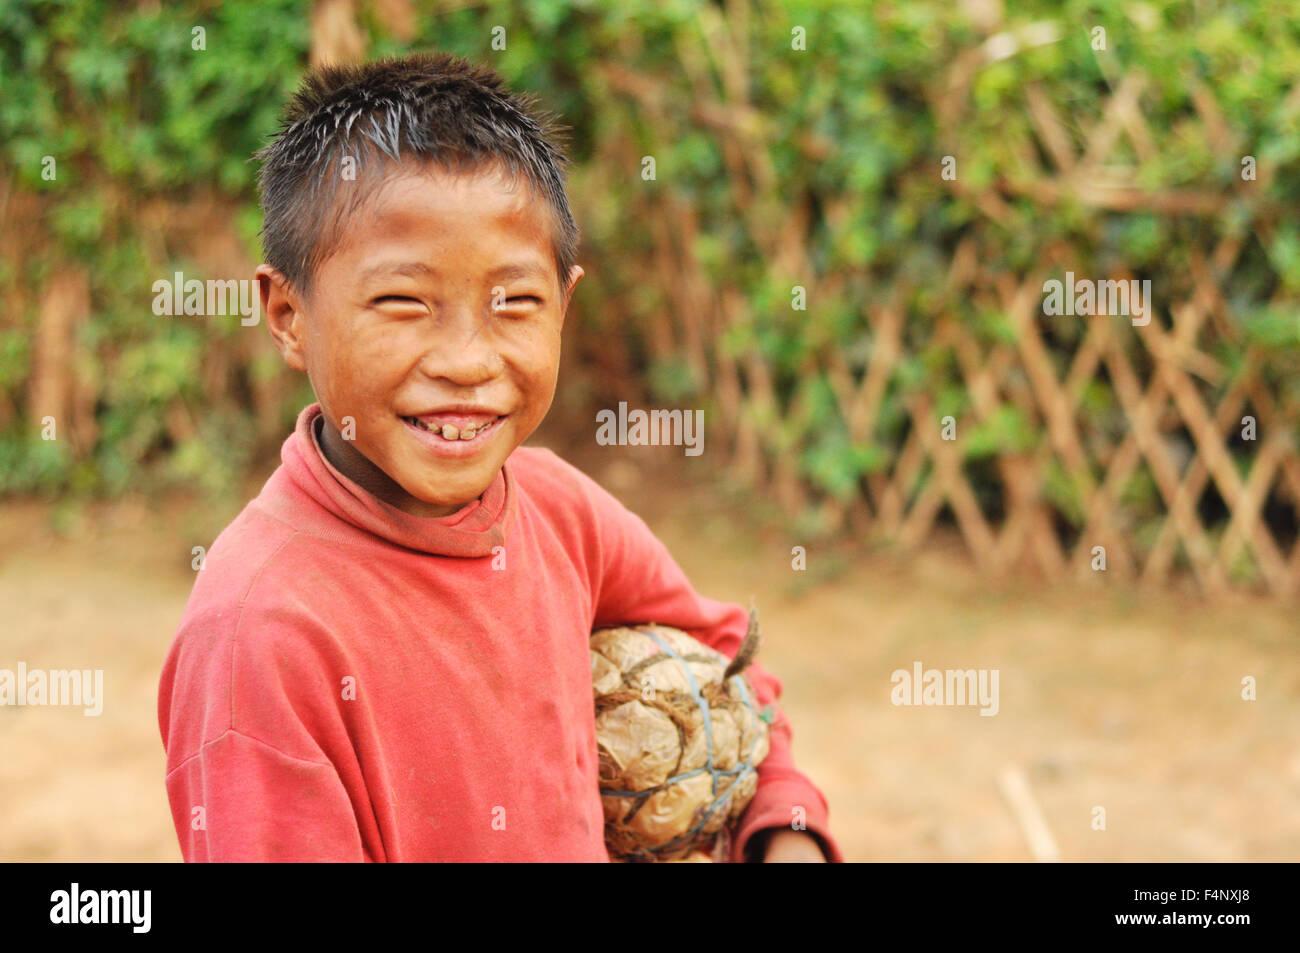 Nagaland, India - March 2012: Happy young footballer with self-made ball smiles at camera, Nagaland, remote region Stock Photo